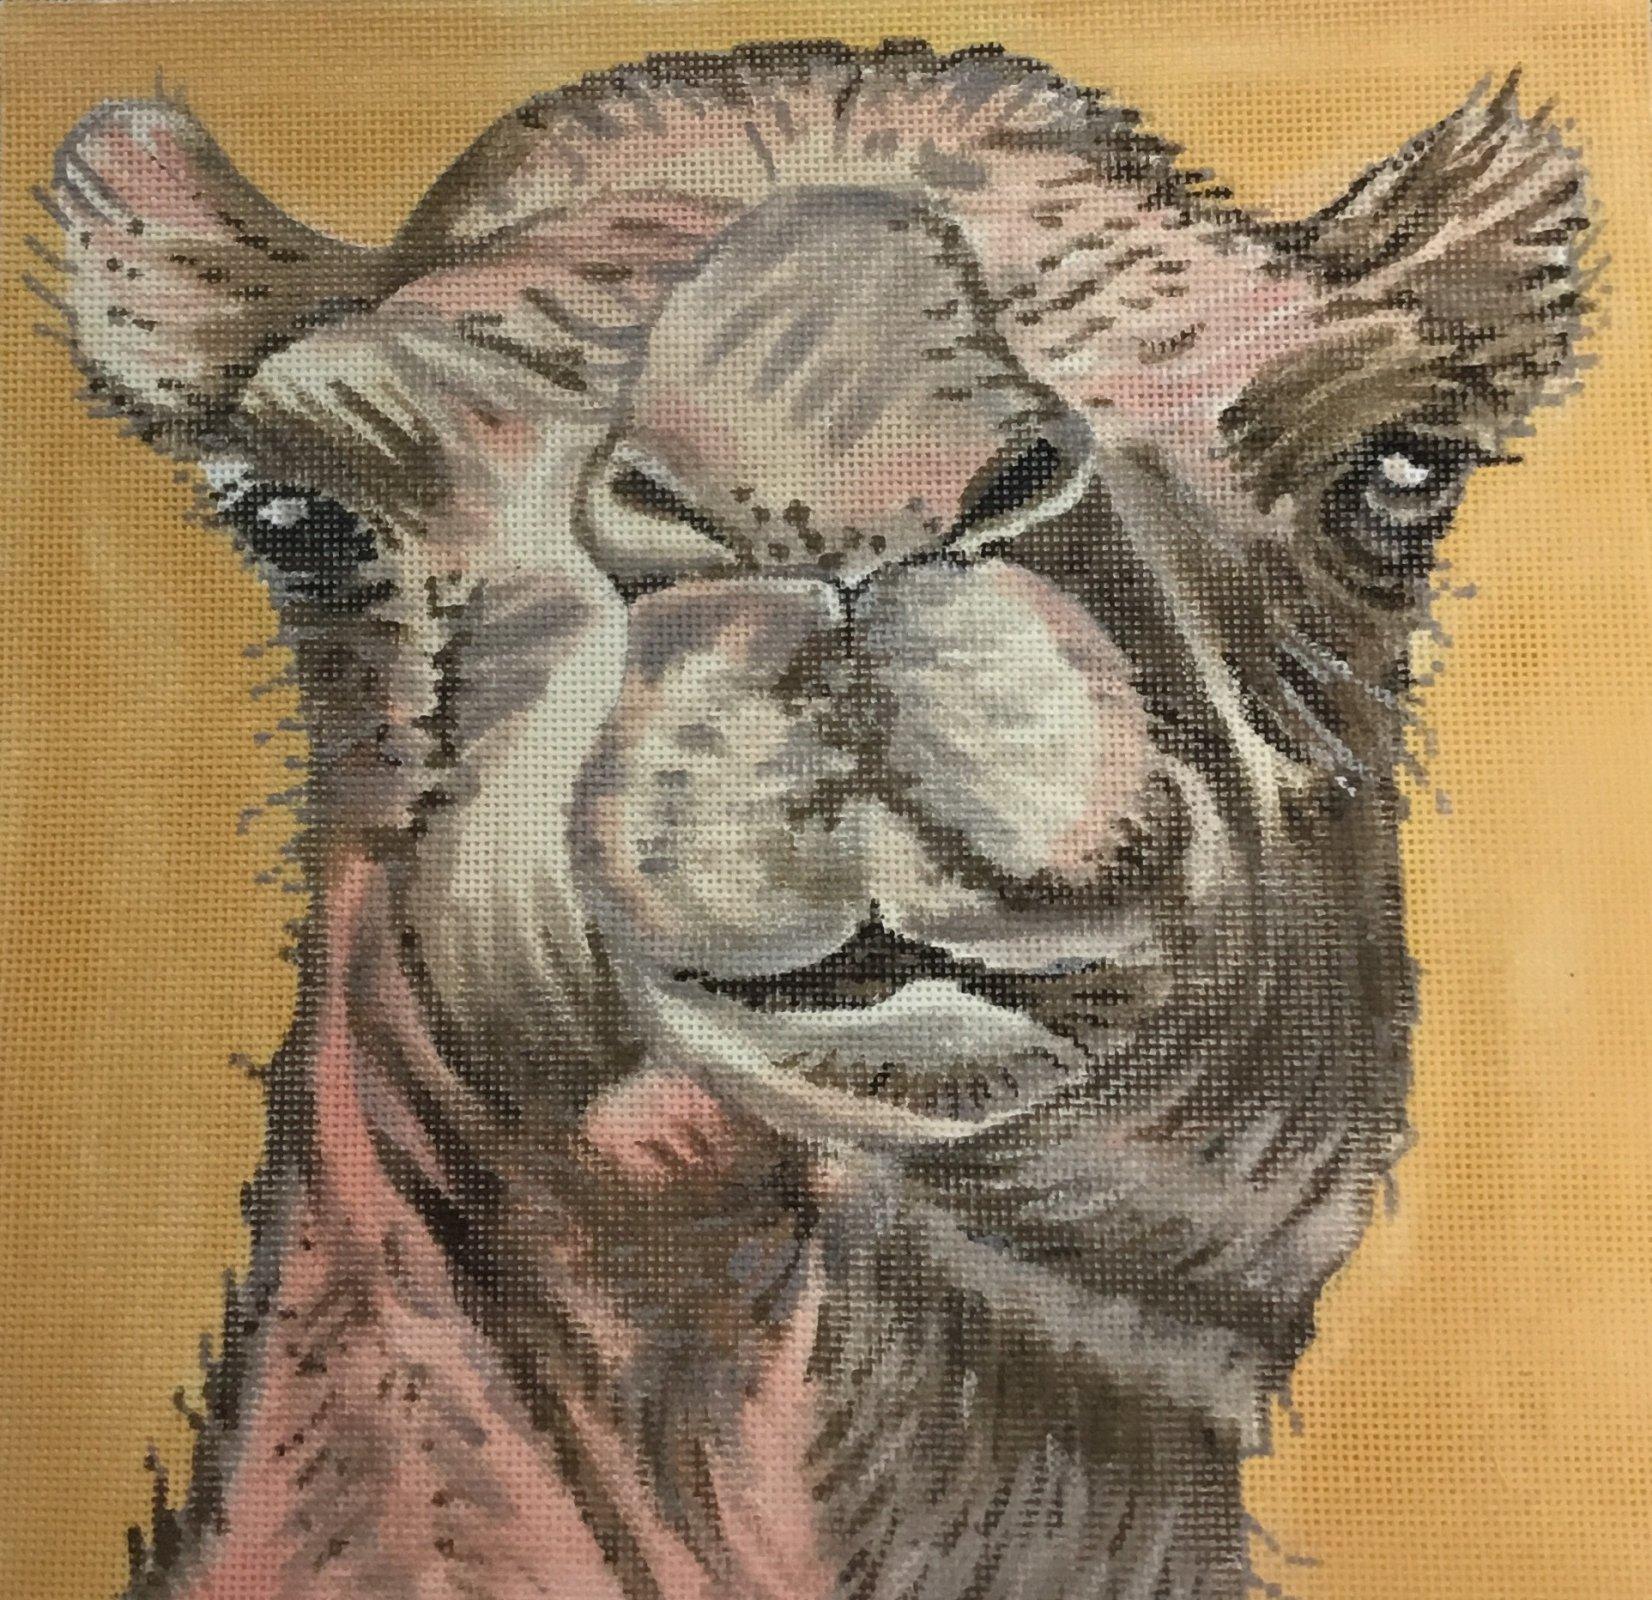 Camel, 13 ct., 13 x 13